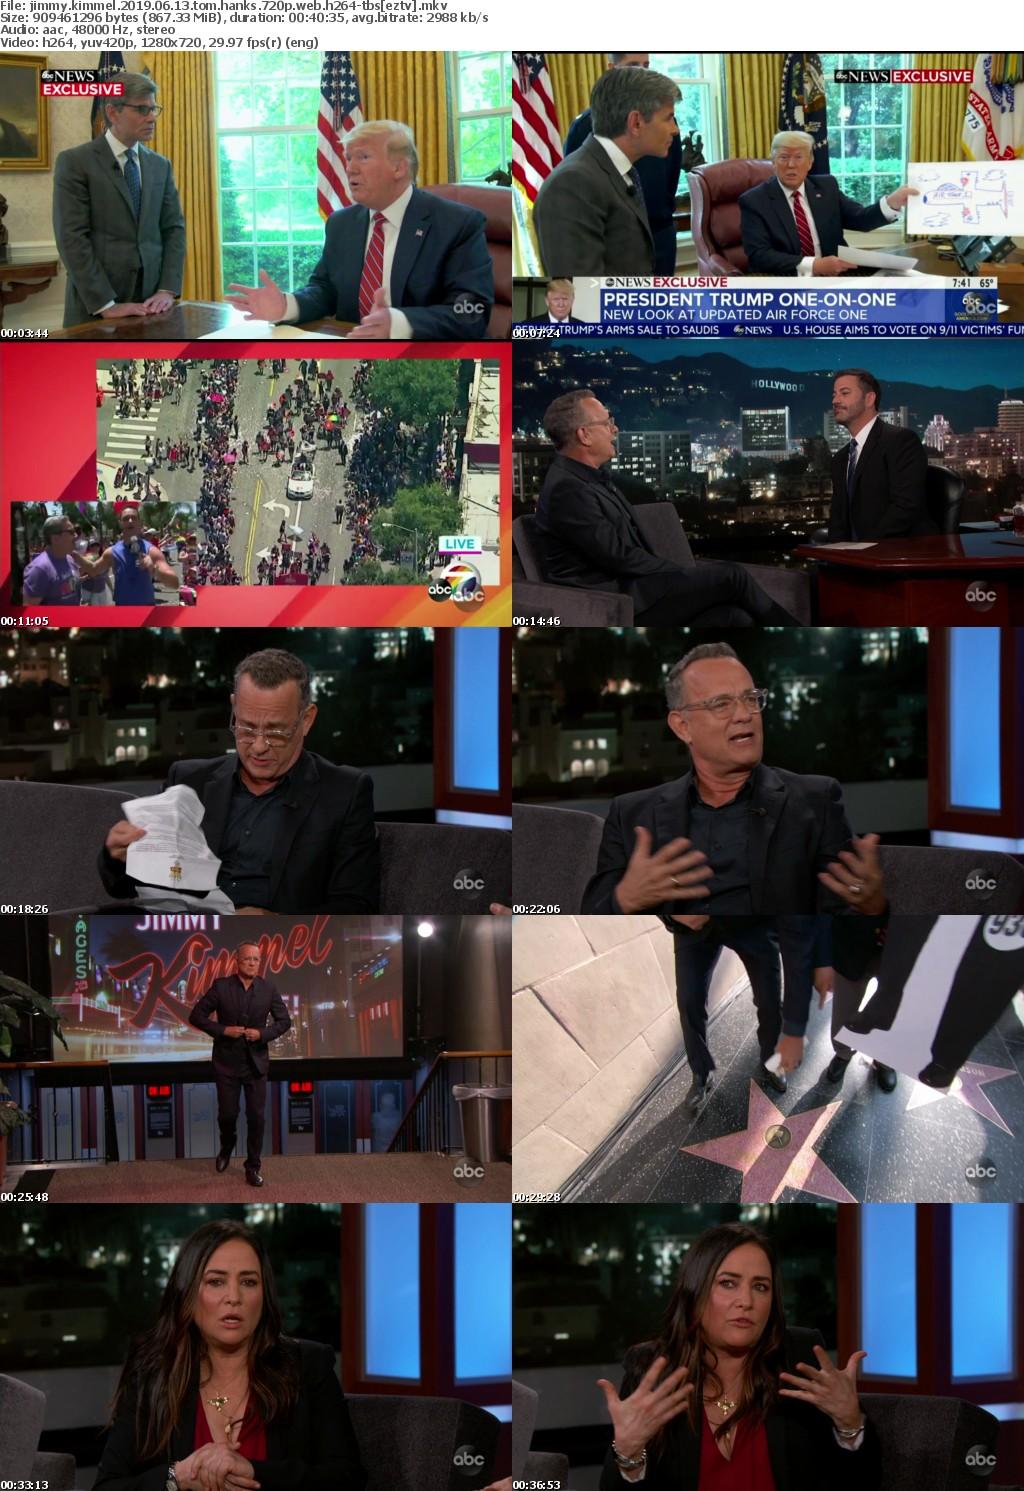 Jimmy Kimmel 2019 06 13 Tom Hanks 720p WEB h264-TBS